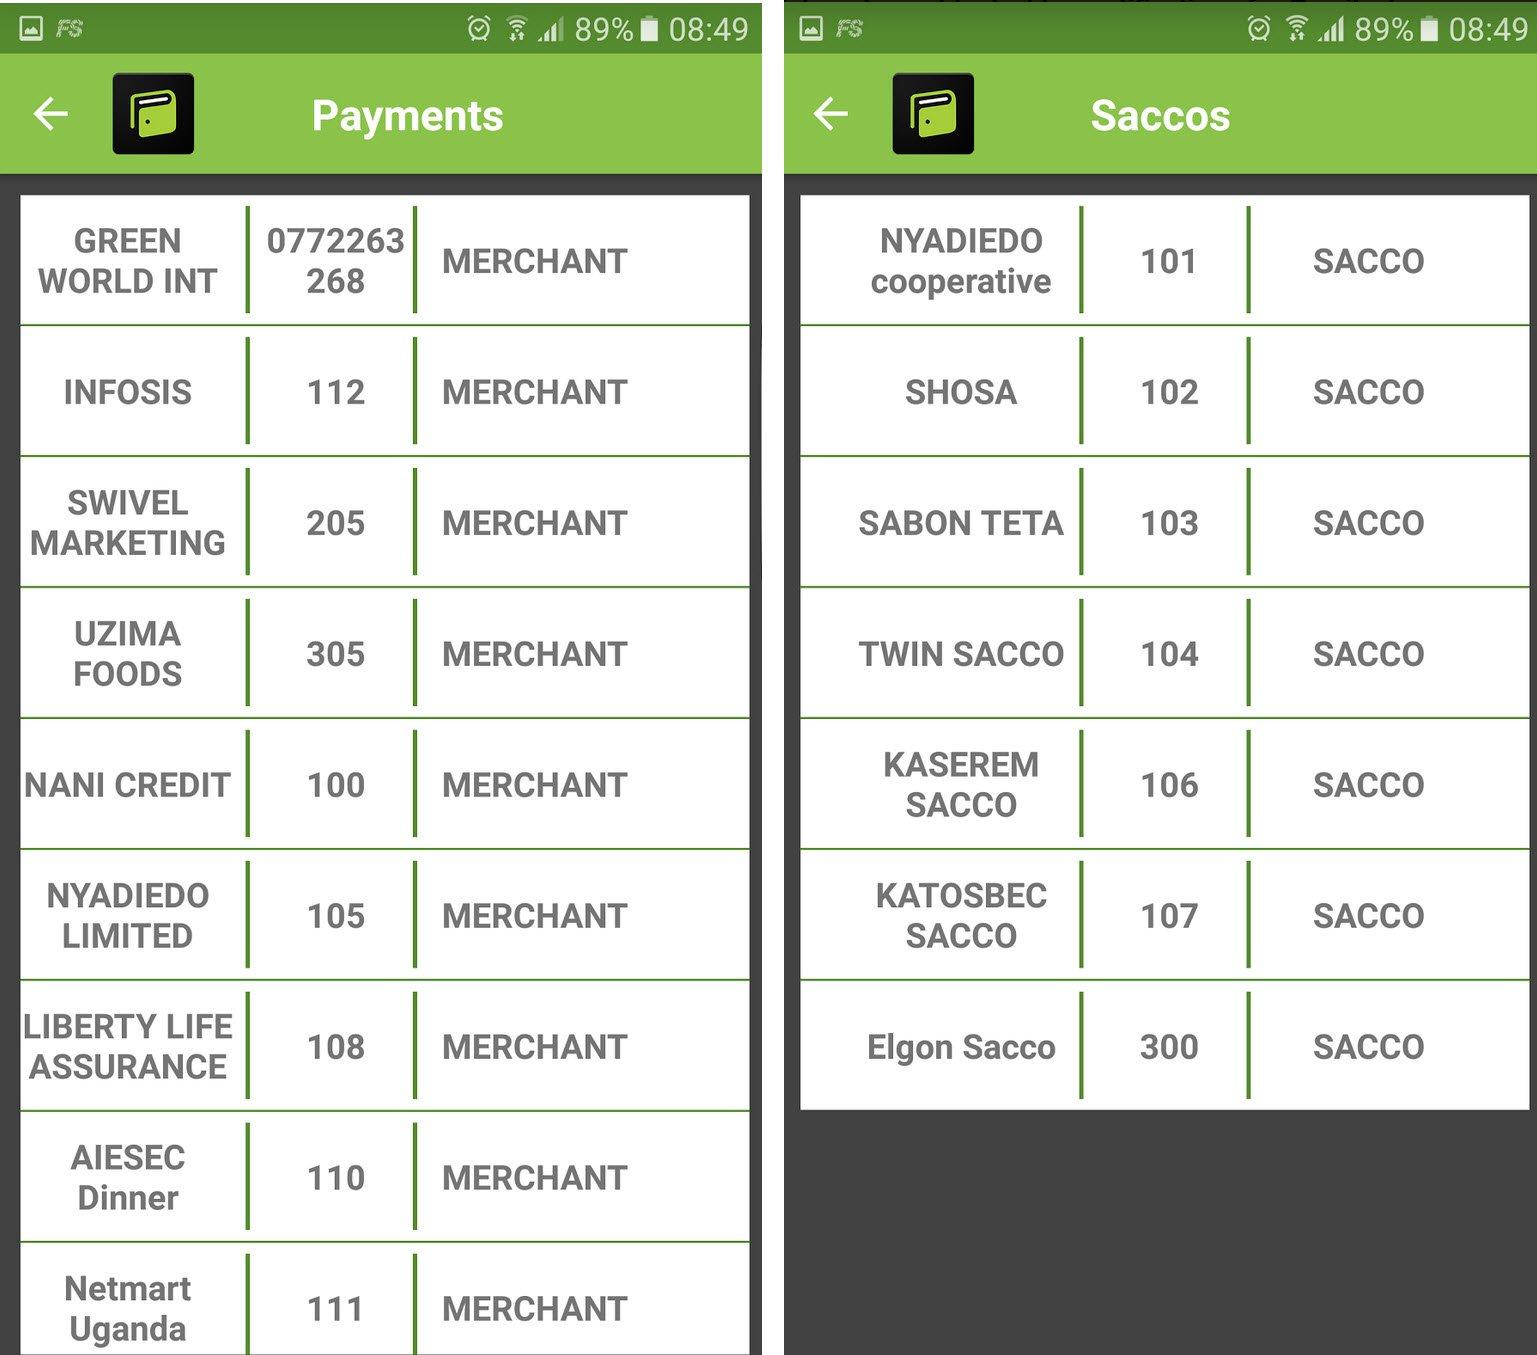 POKETI Payments & SACCOs